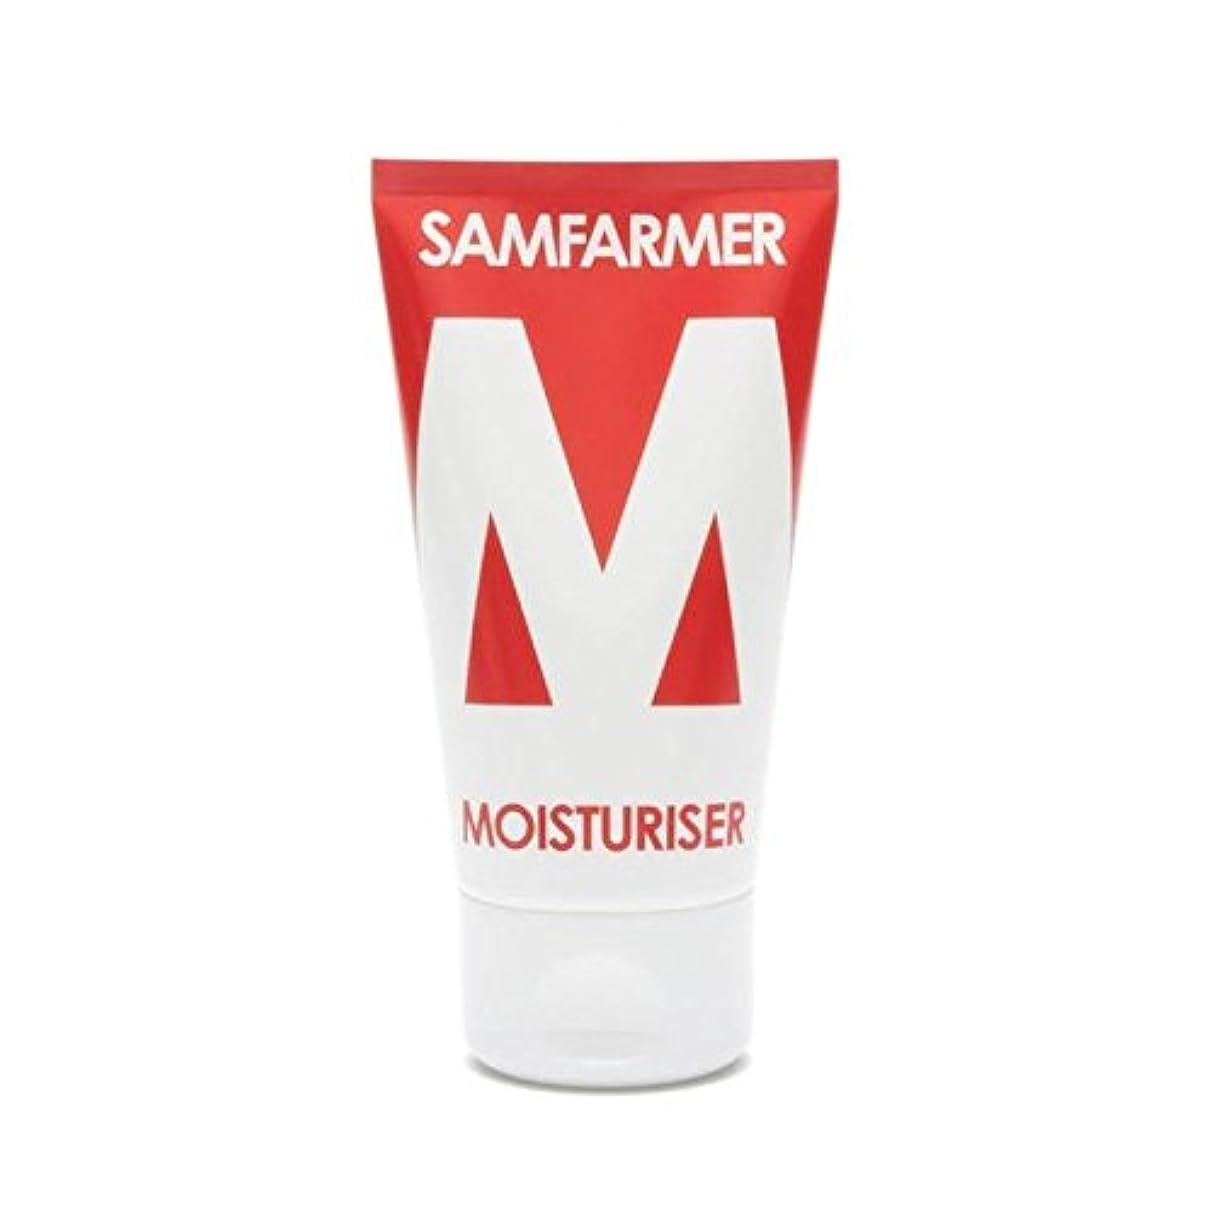 SAMFARMER Unisex Moisturiser 50ml - ユニセックス保湿50ミリリットル [並行輸入品]